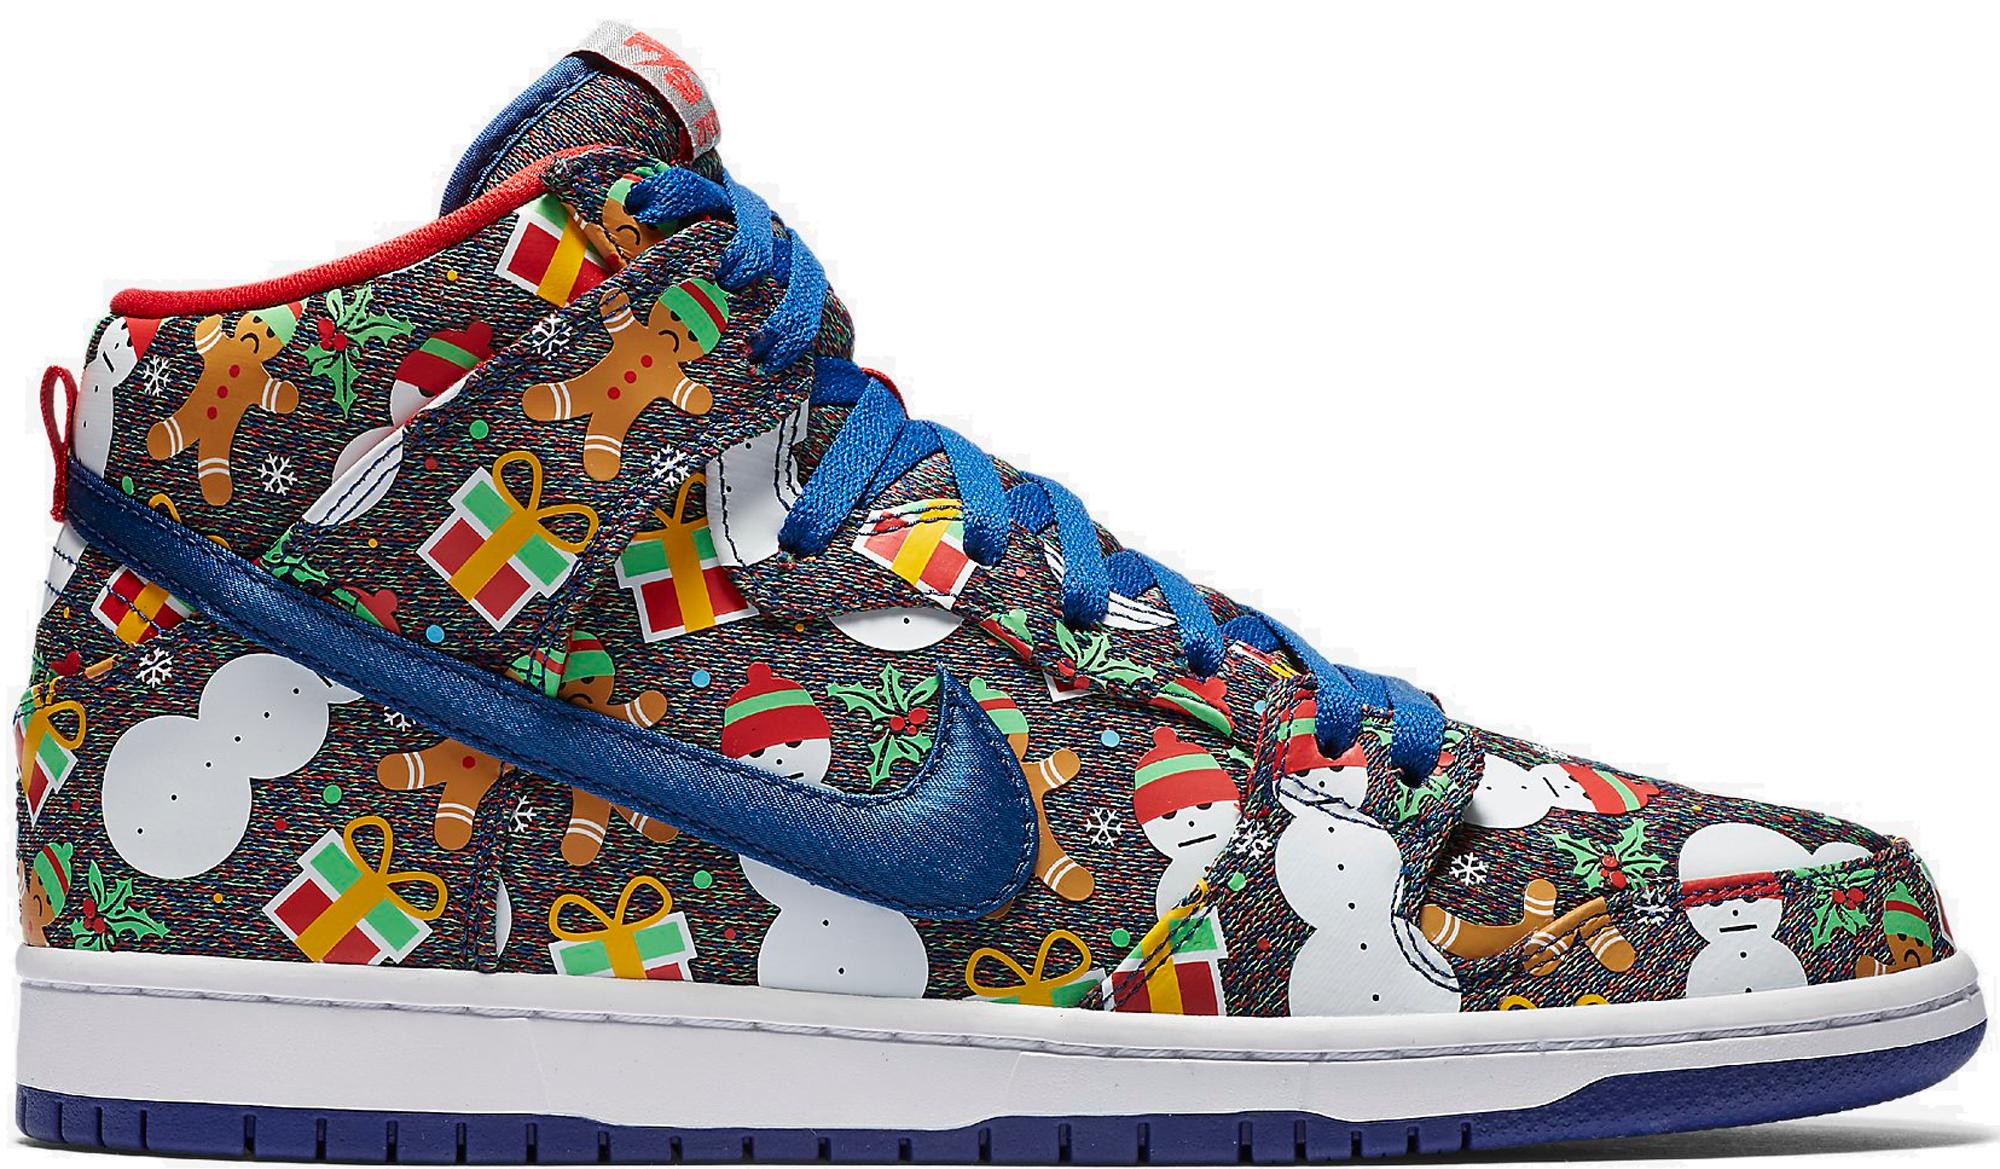 reputable site e9adf c6866 lebron 9 christmas size 5.5 Nike ...